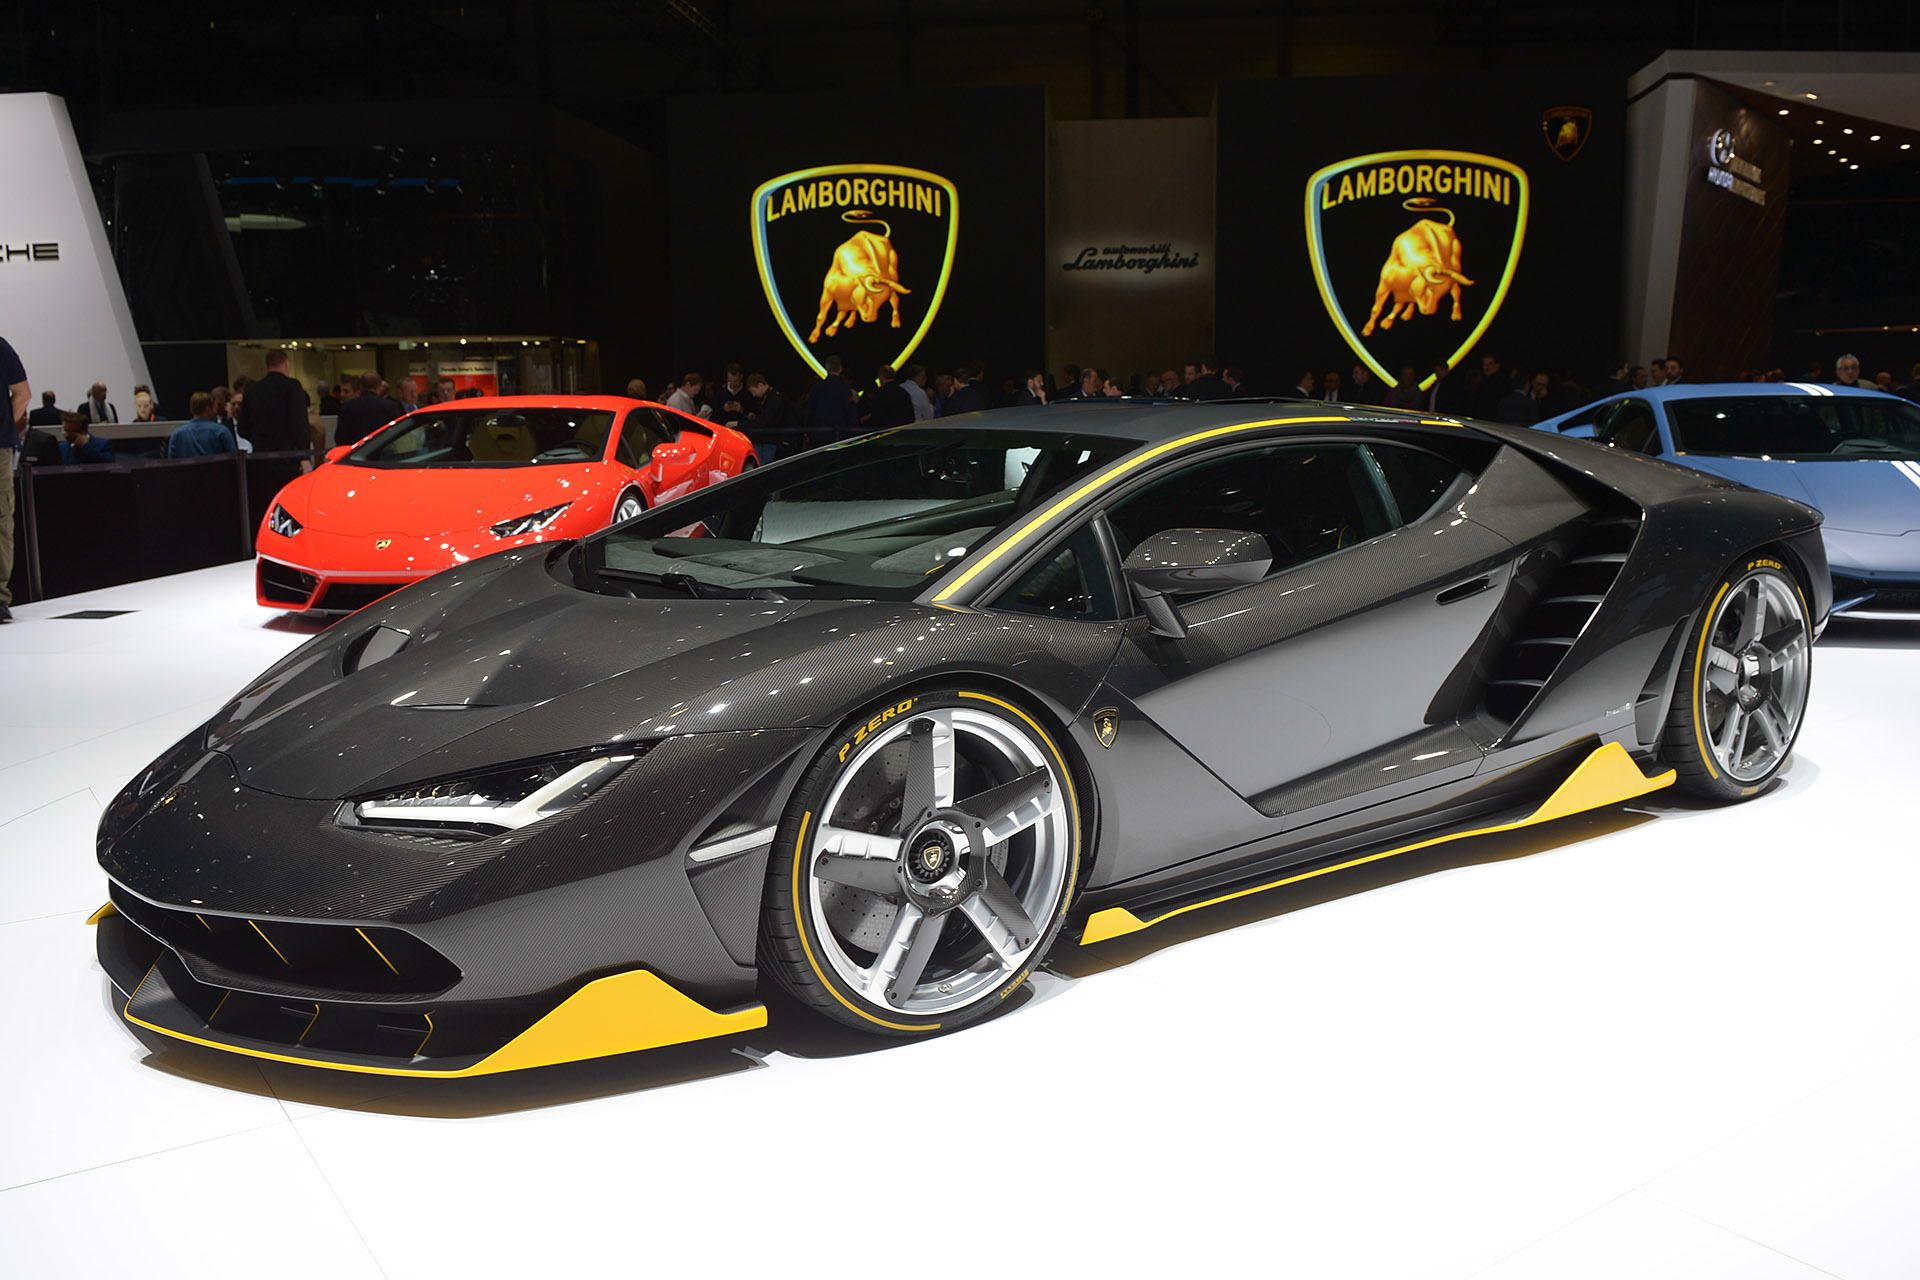 Lamborghini Centenario Blows Our Minds With 760 Horsepower Lamborghini Centenario Lamborghini Super Cars